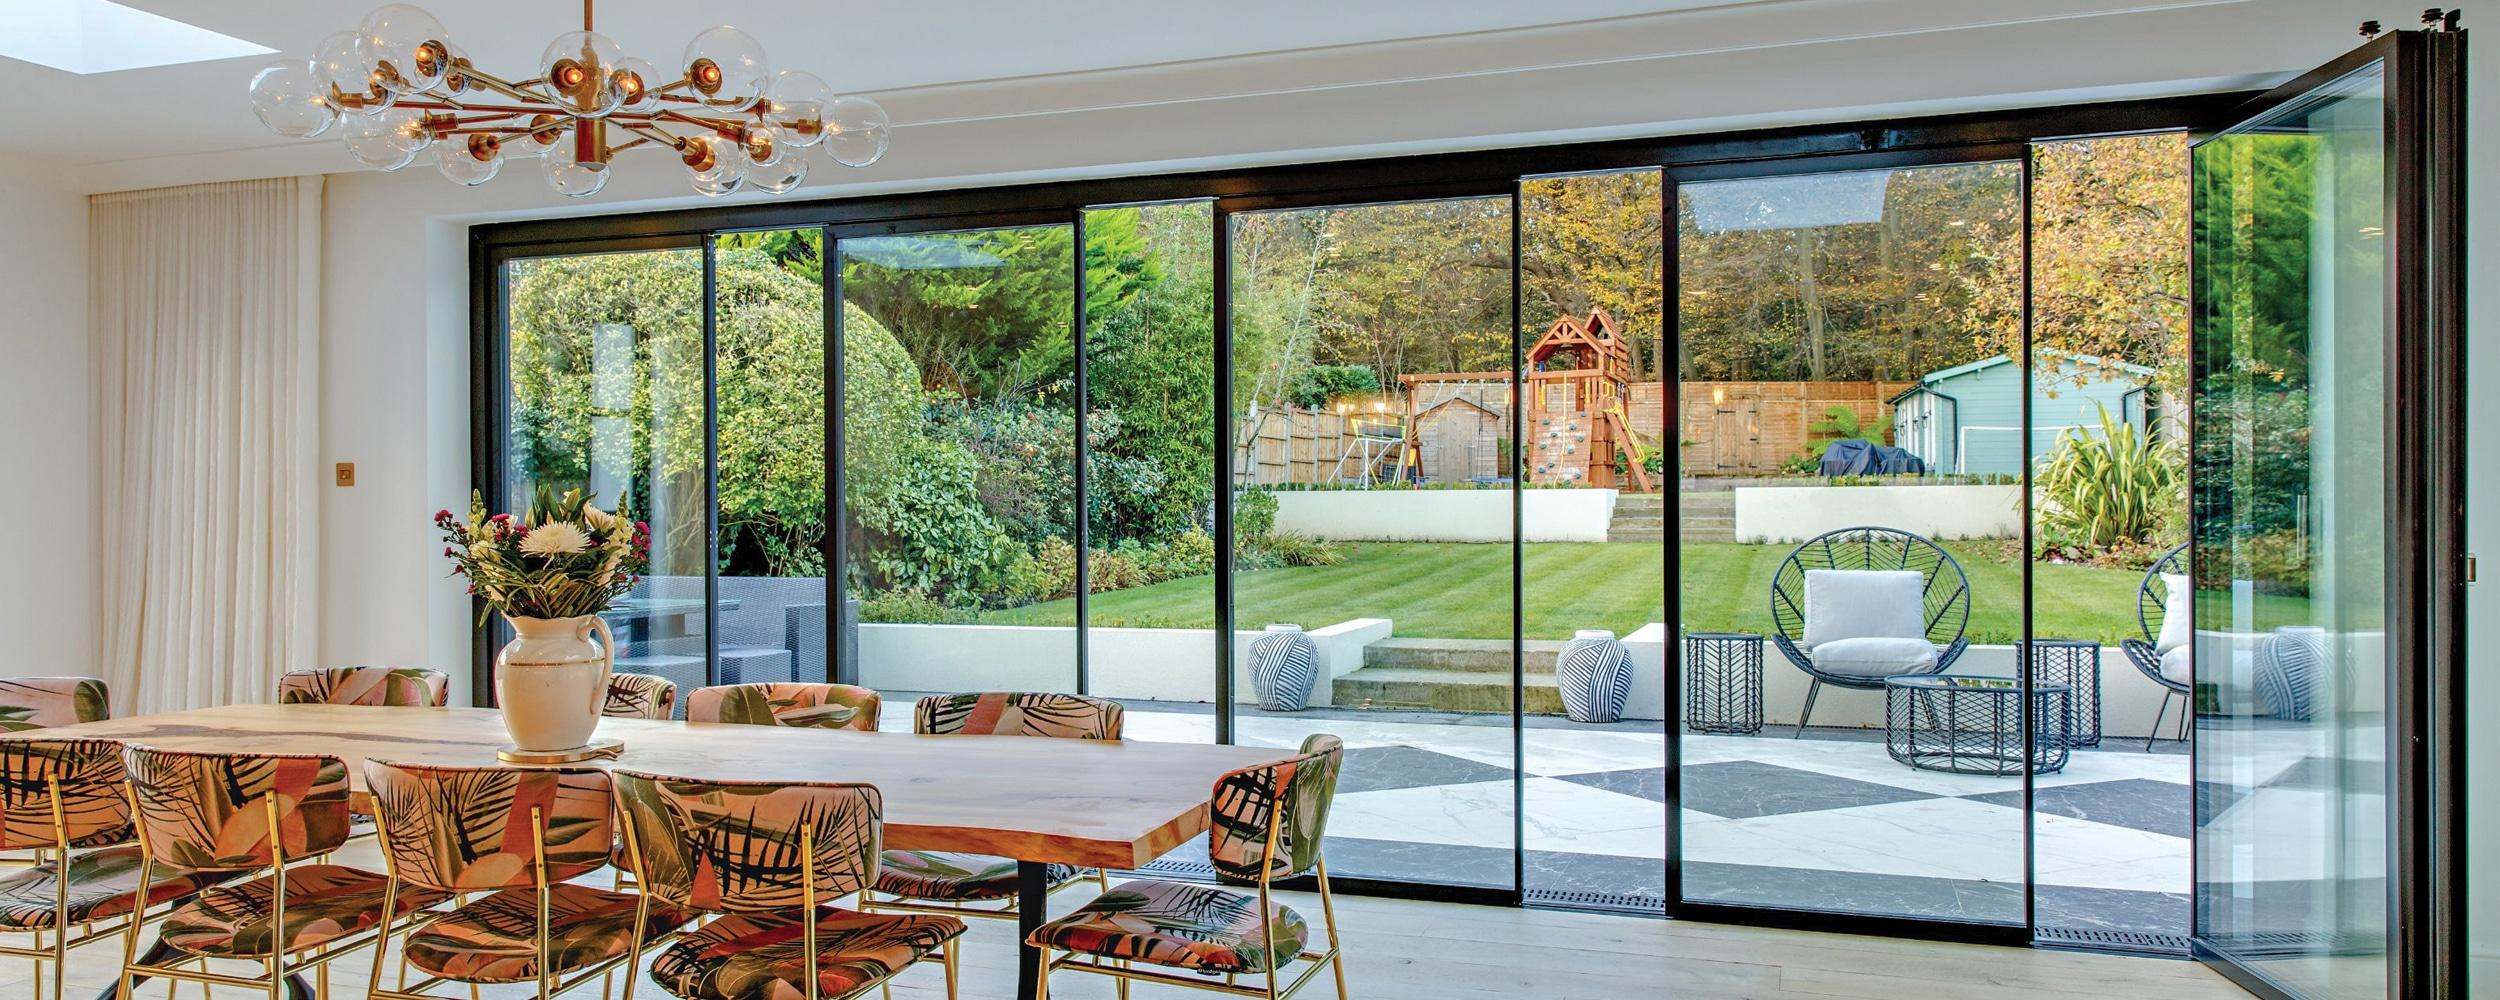 6-panel vistaline slide and turn doors